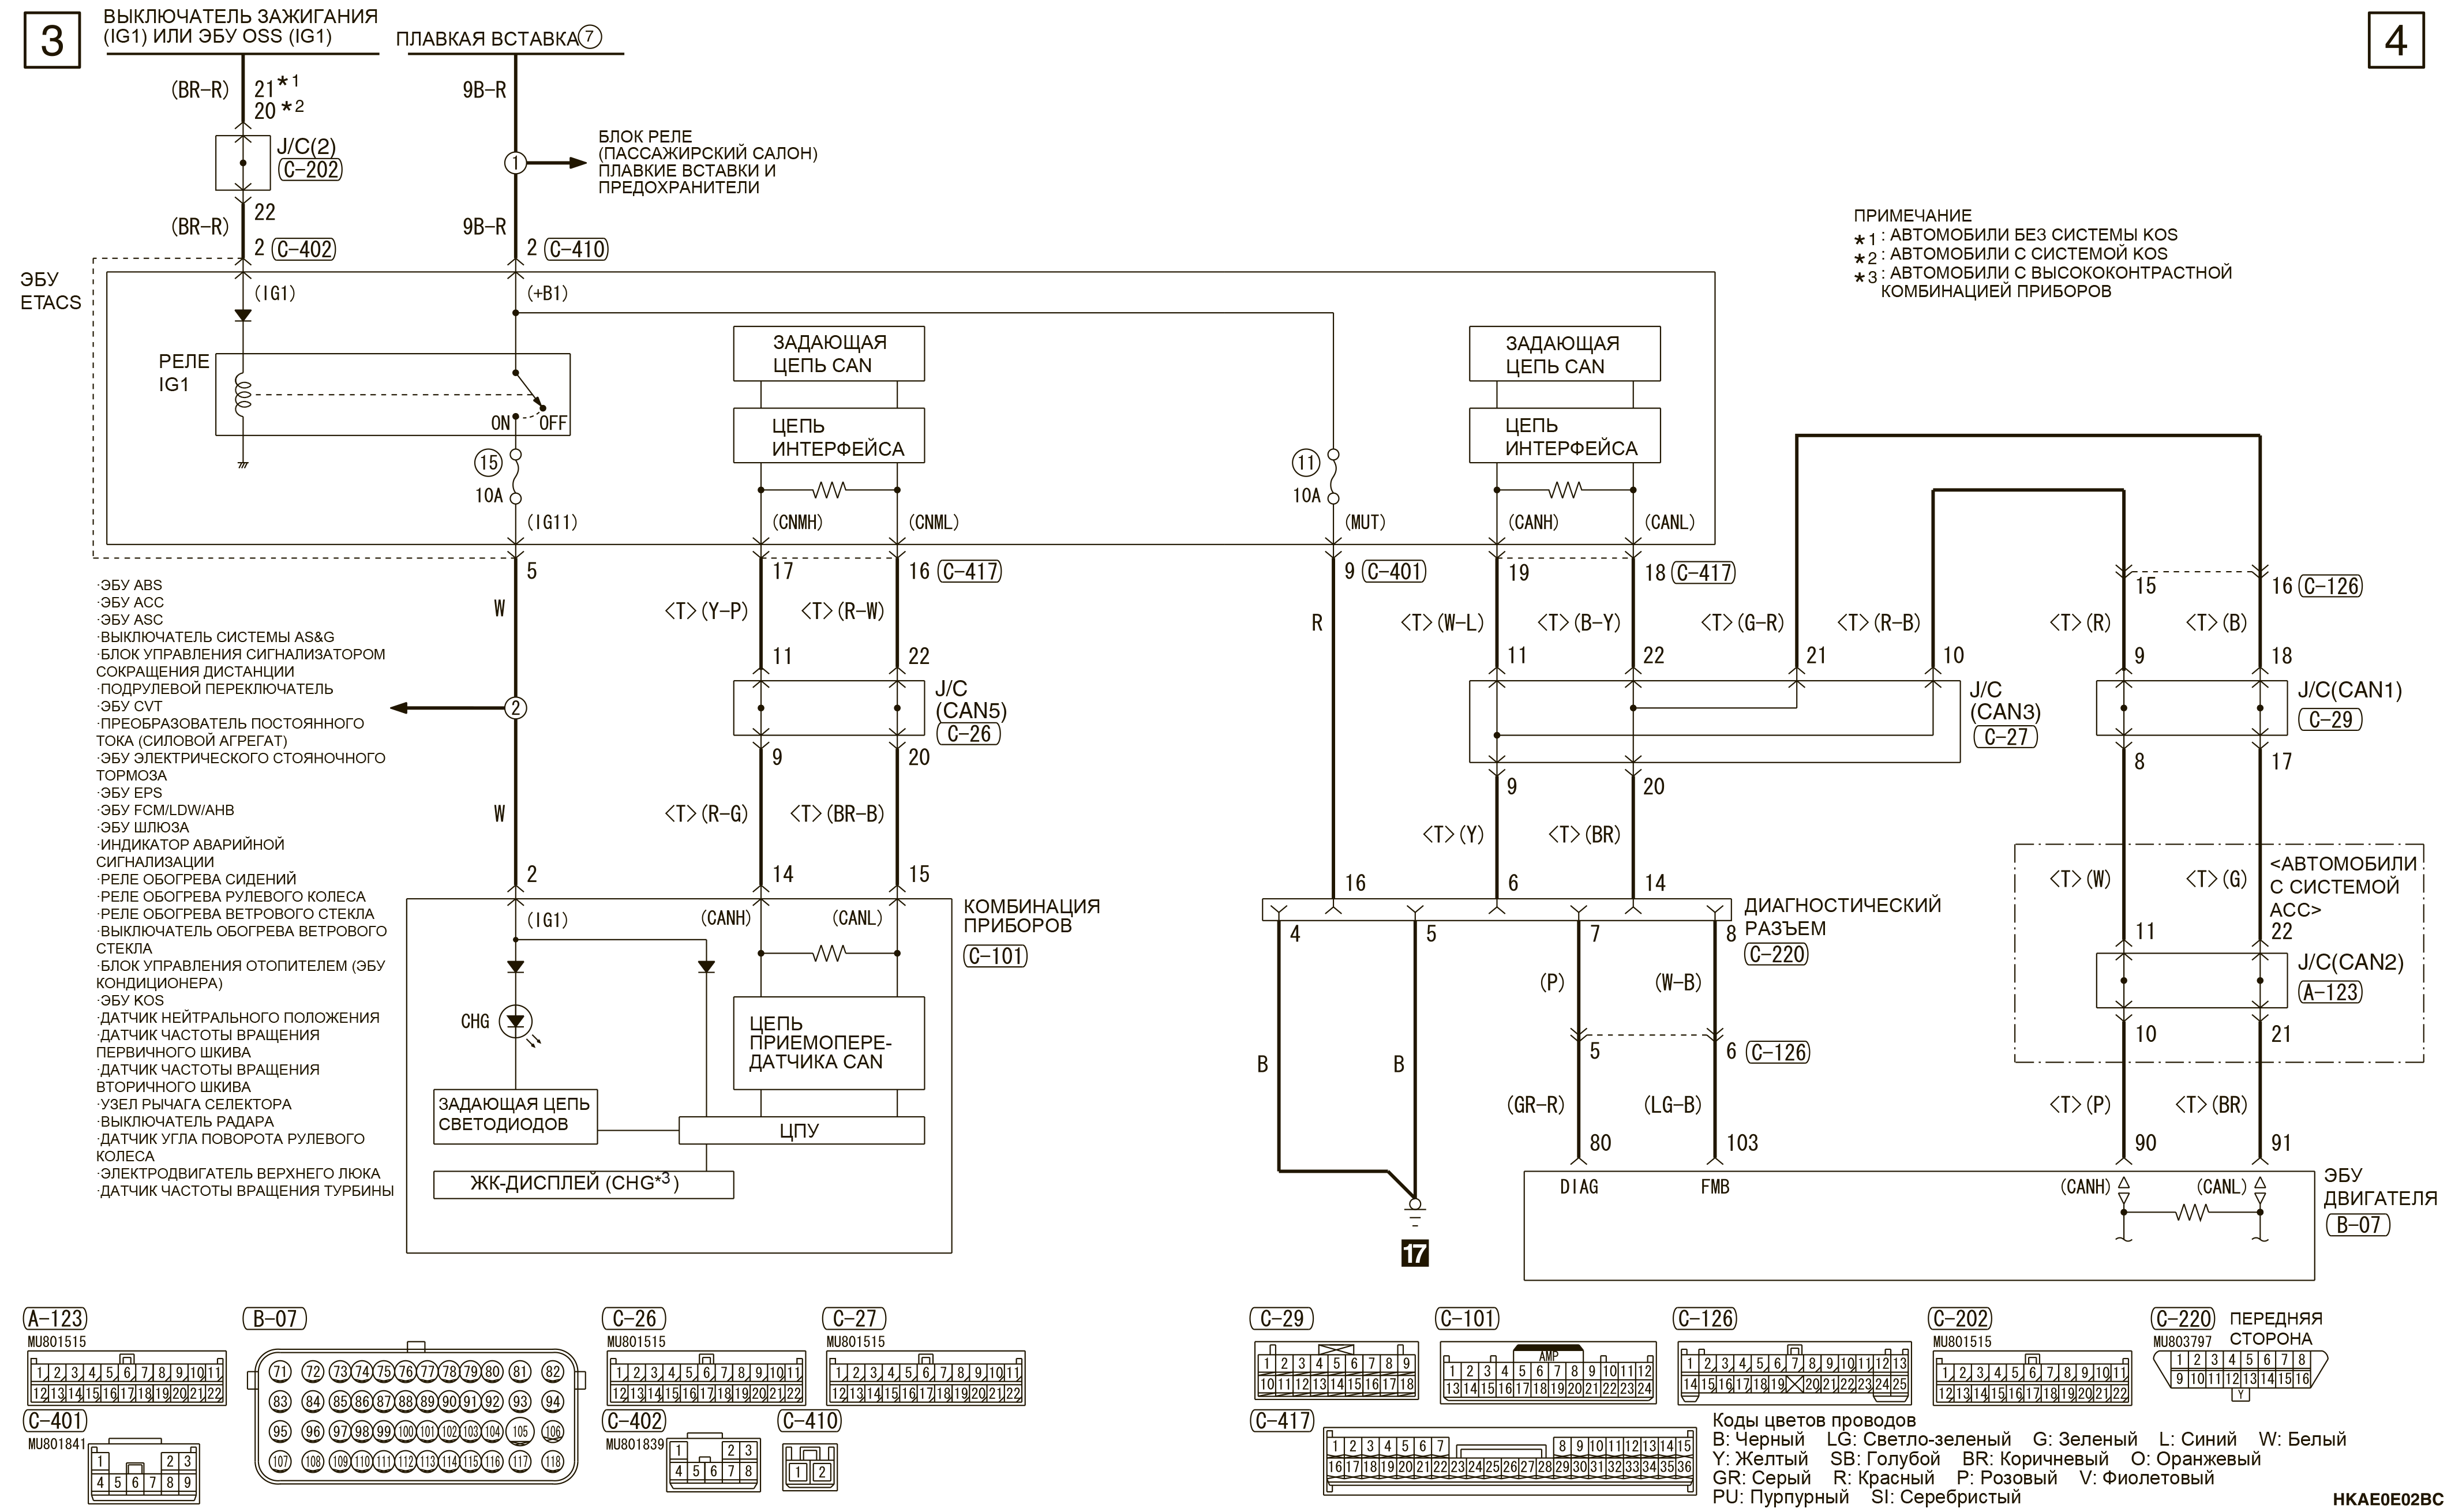 mmc аутлендер 3 2019 электросхемаСИСТЕМА ЭЛЕКТРОСНАБЖЕНИЯ 4J1 (ЛЕВАЯ)